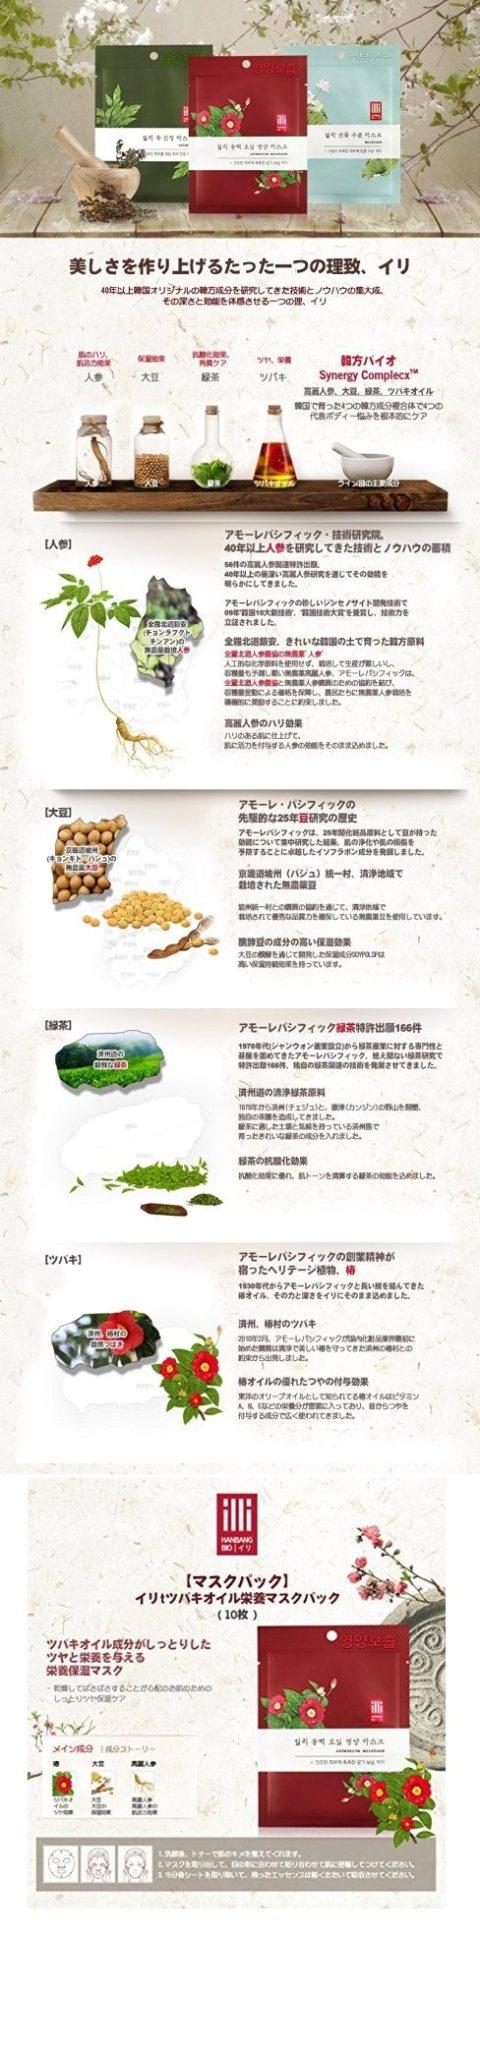 ARITAUM Camellia Oil Nourishing Mask 27g x 3 pcs [Intensive Moisture]